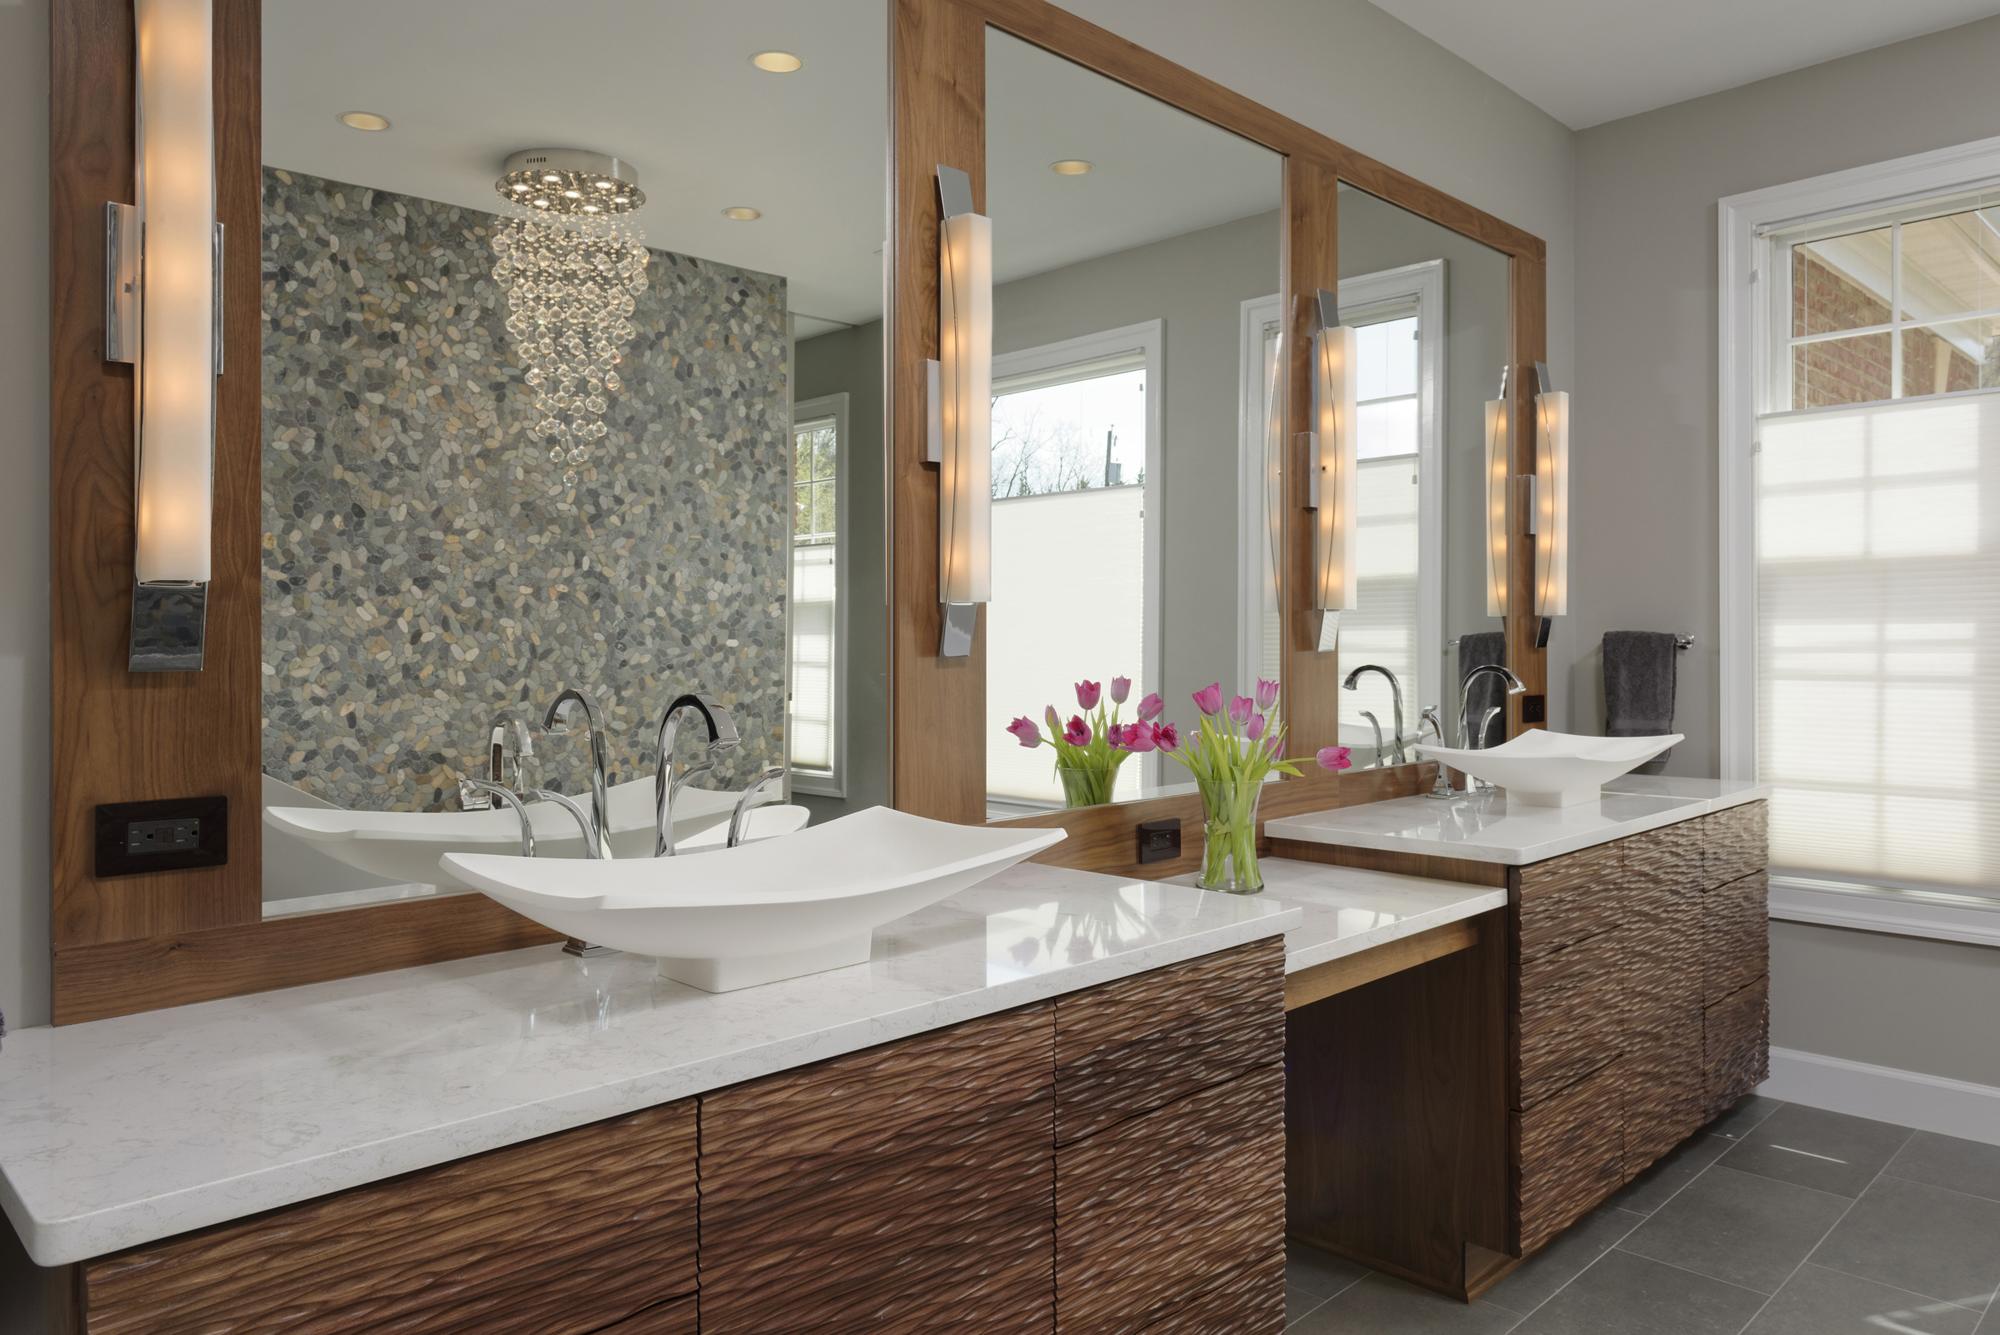 sampling of bathroom renovation photos - Bathroom Remodeling Bethesda Md